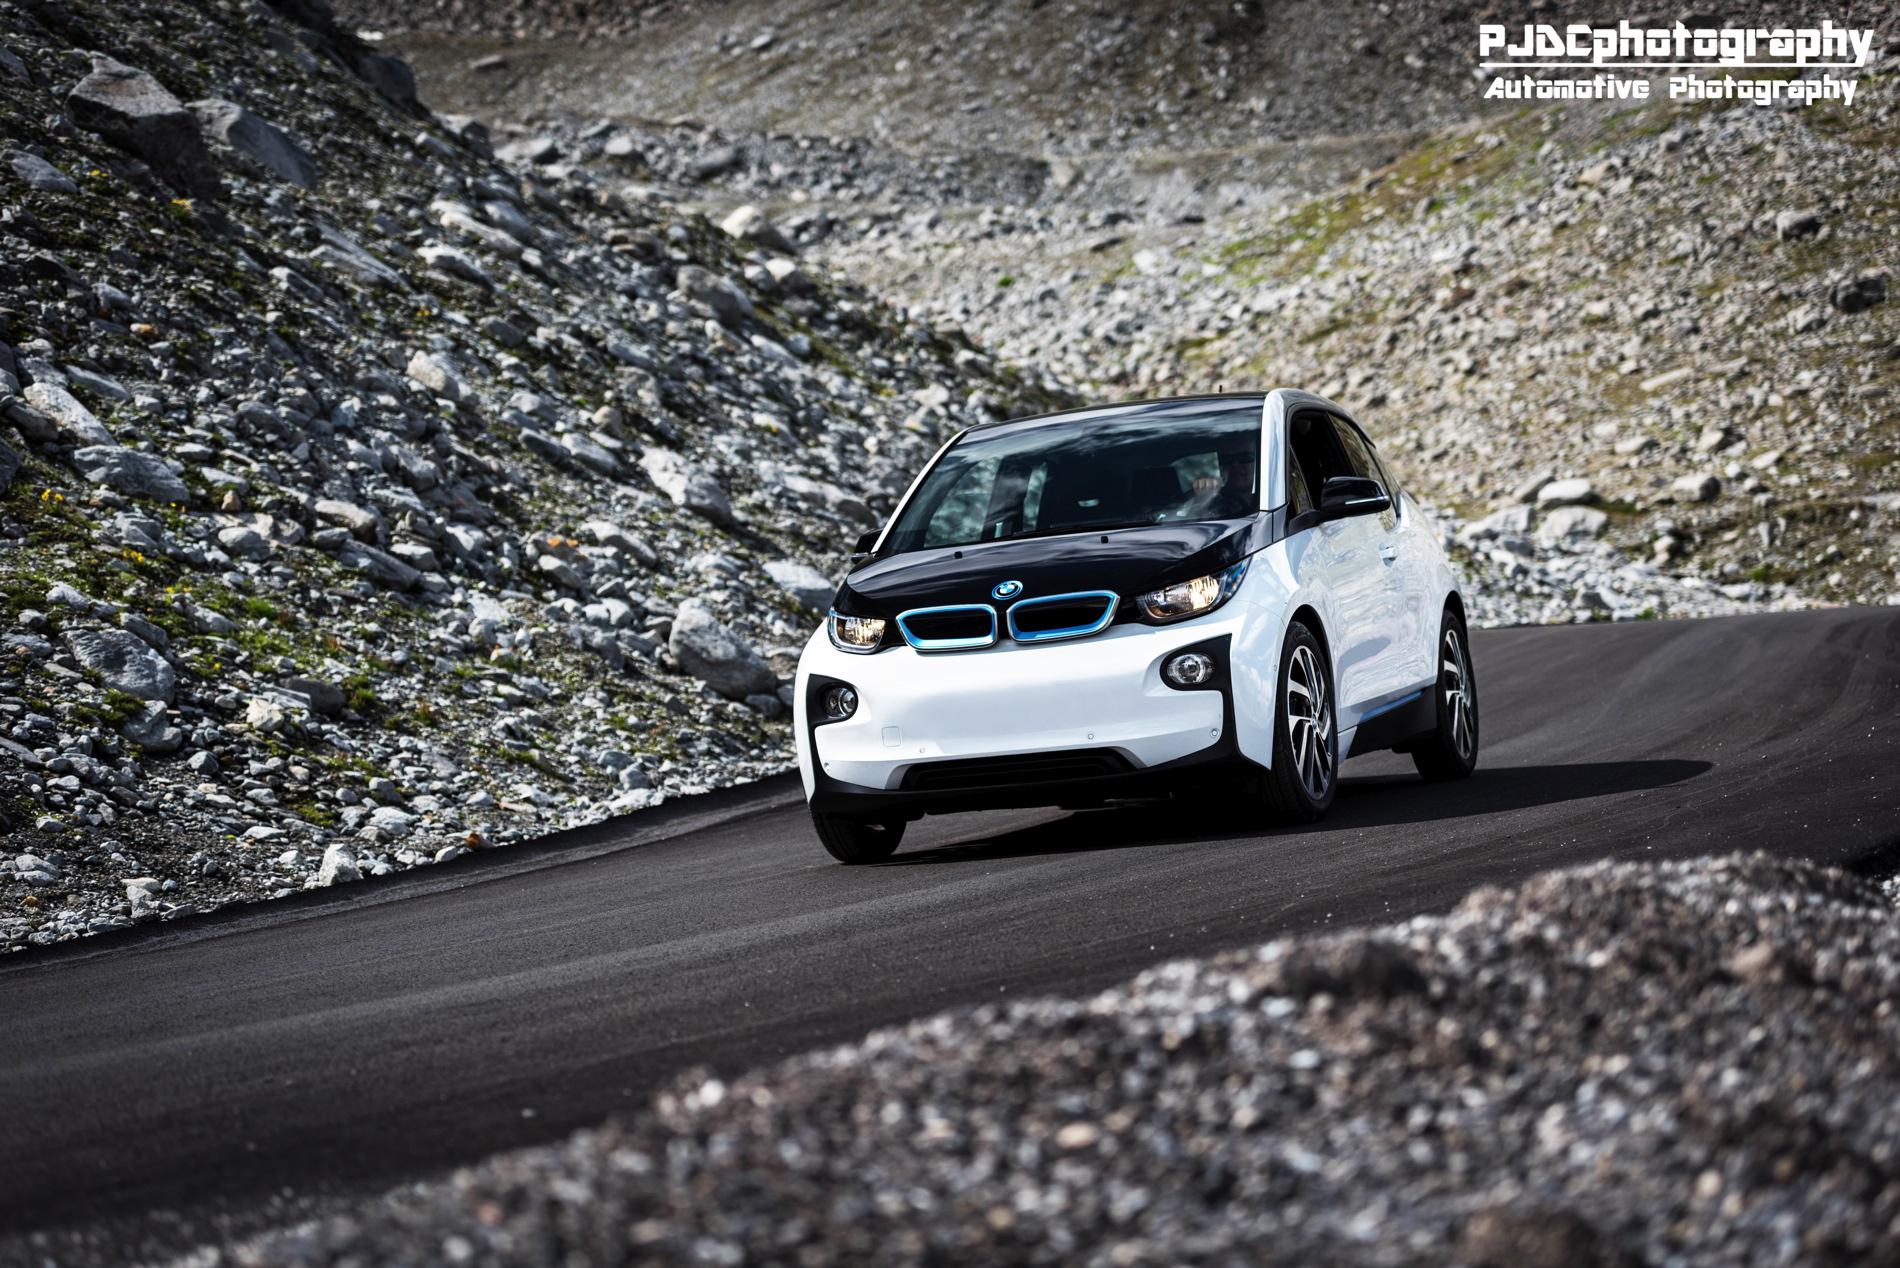 BMW i3 photoshoot alps images 1900x1200 10